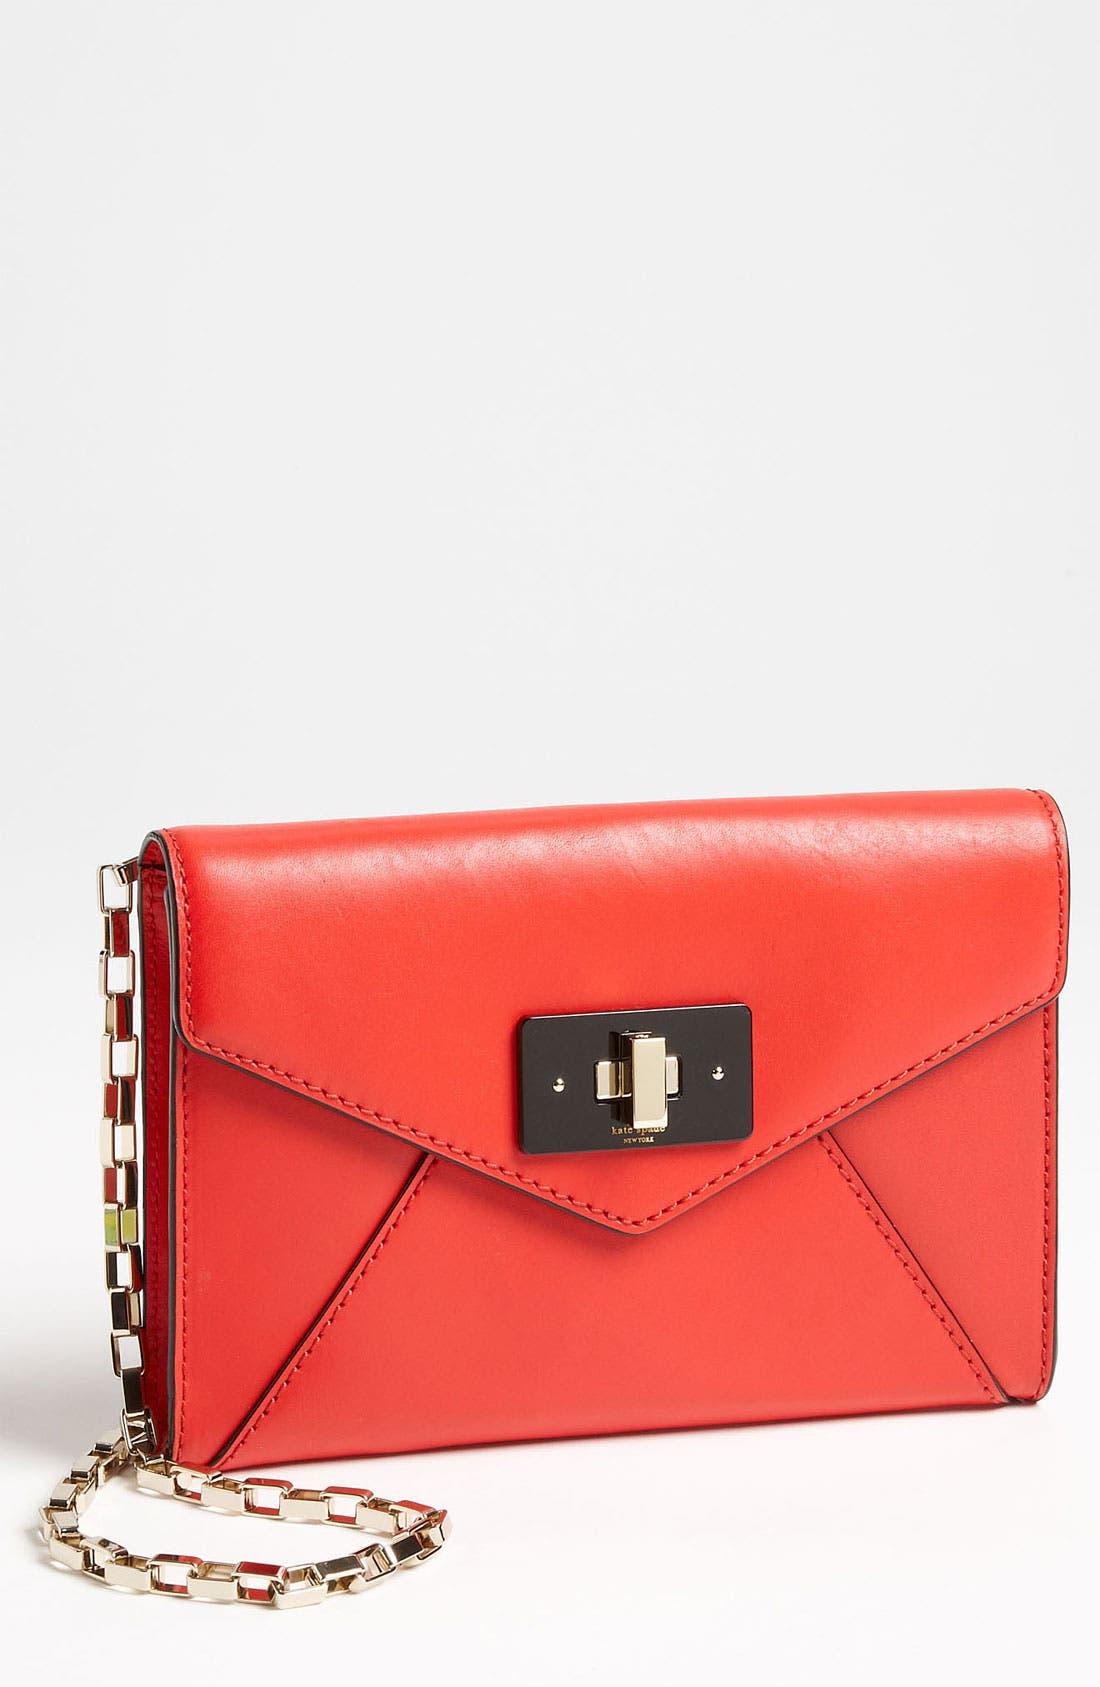 Main Image - kate spade new york 'post street - sonia' crossbody bag